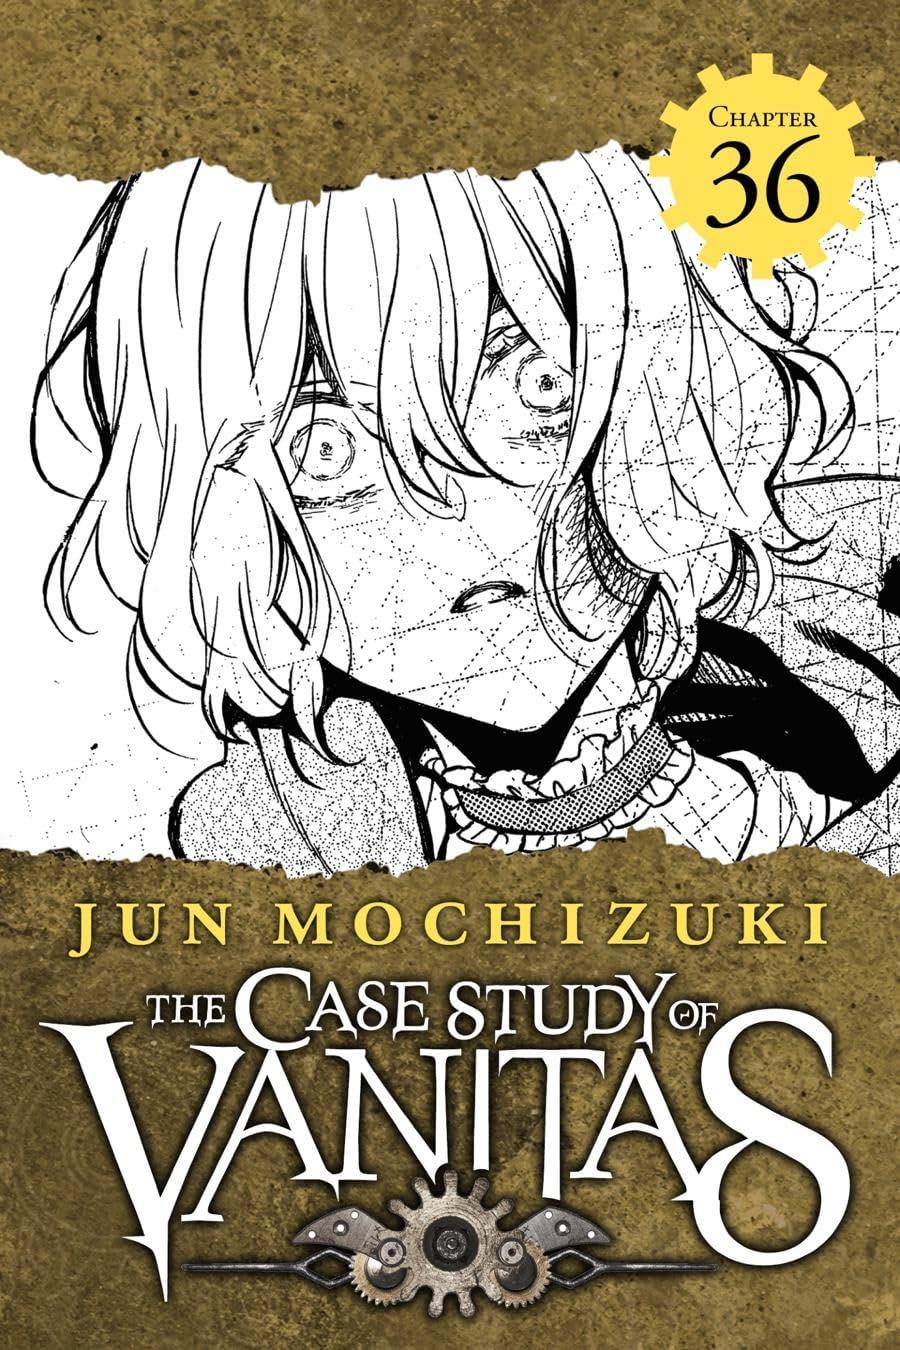 The Case Study of Vanitas #36